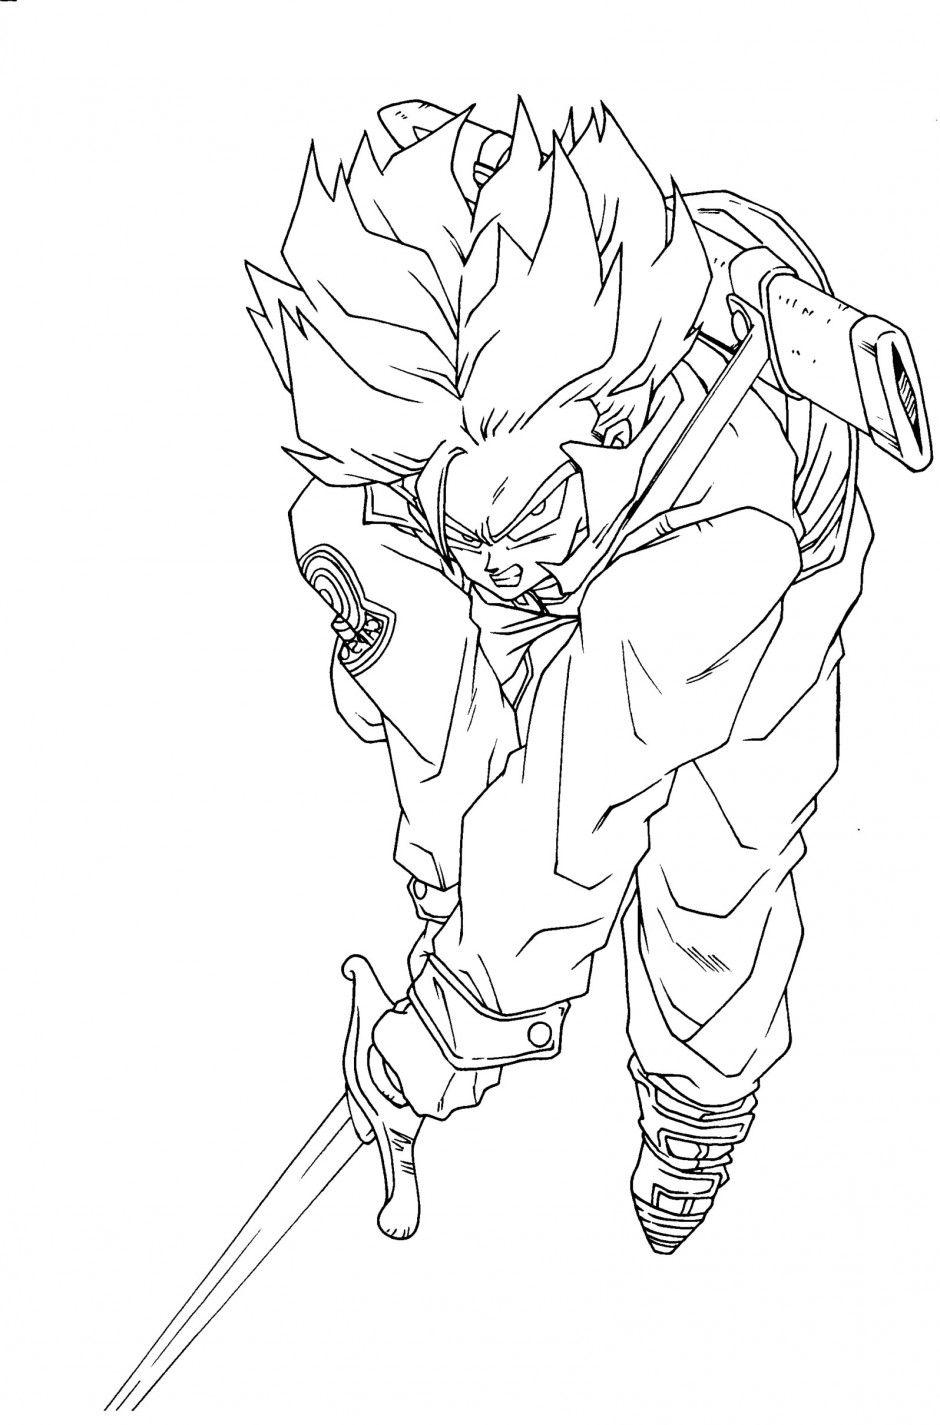 Dragon Ball Z Saiyan Trunks Coloring Pages Trunks Dragon Ball